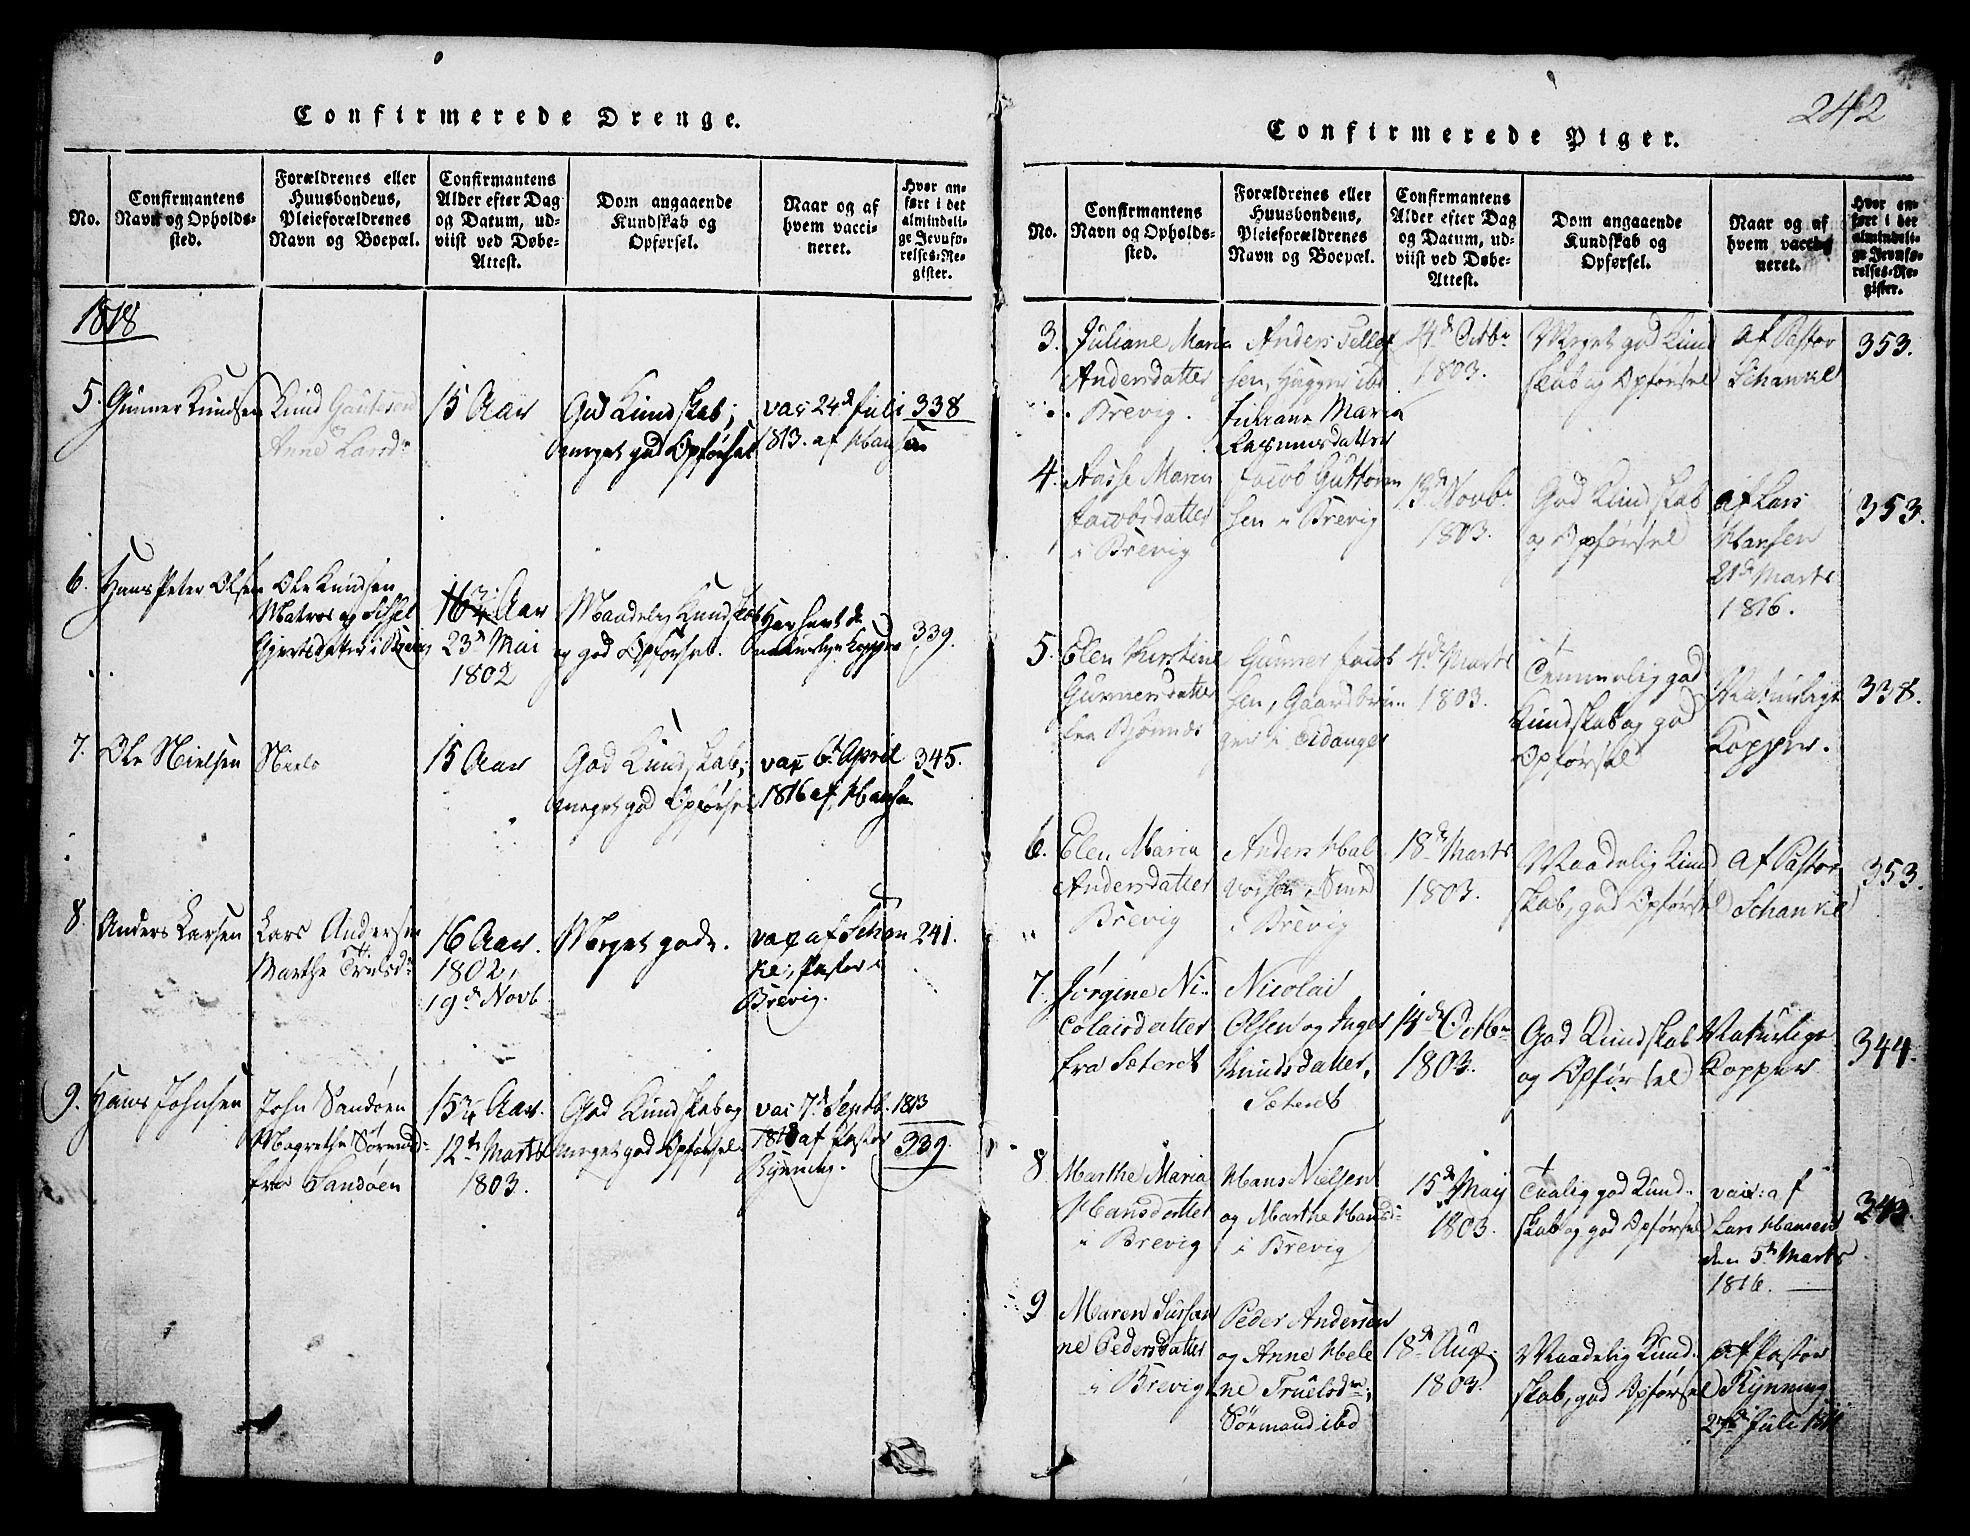 SAKO, Brevik kirkebøker, G/Ga/L0001: Klokkerbok nr. 1, 1814-1845, s. 242